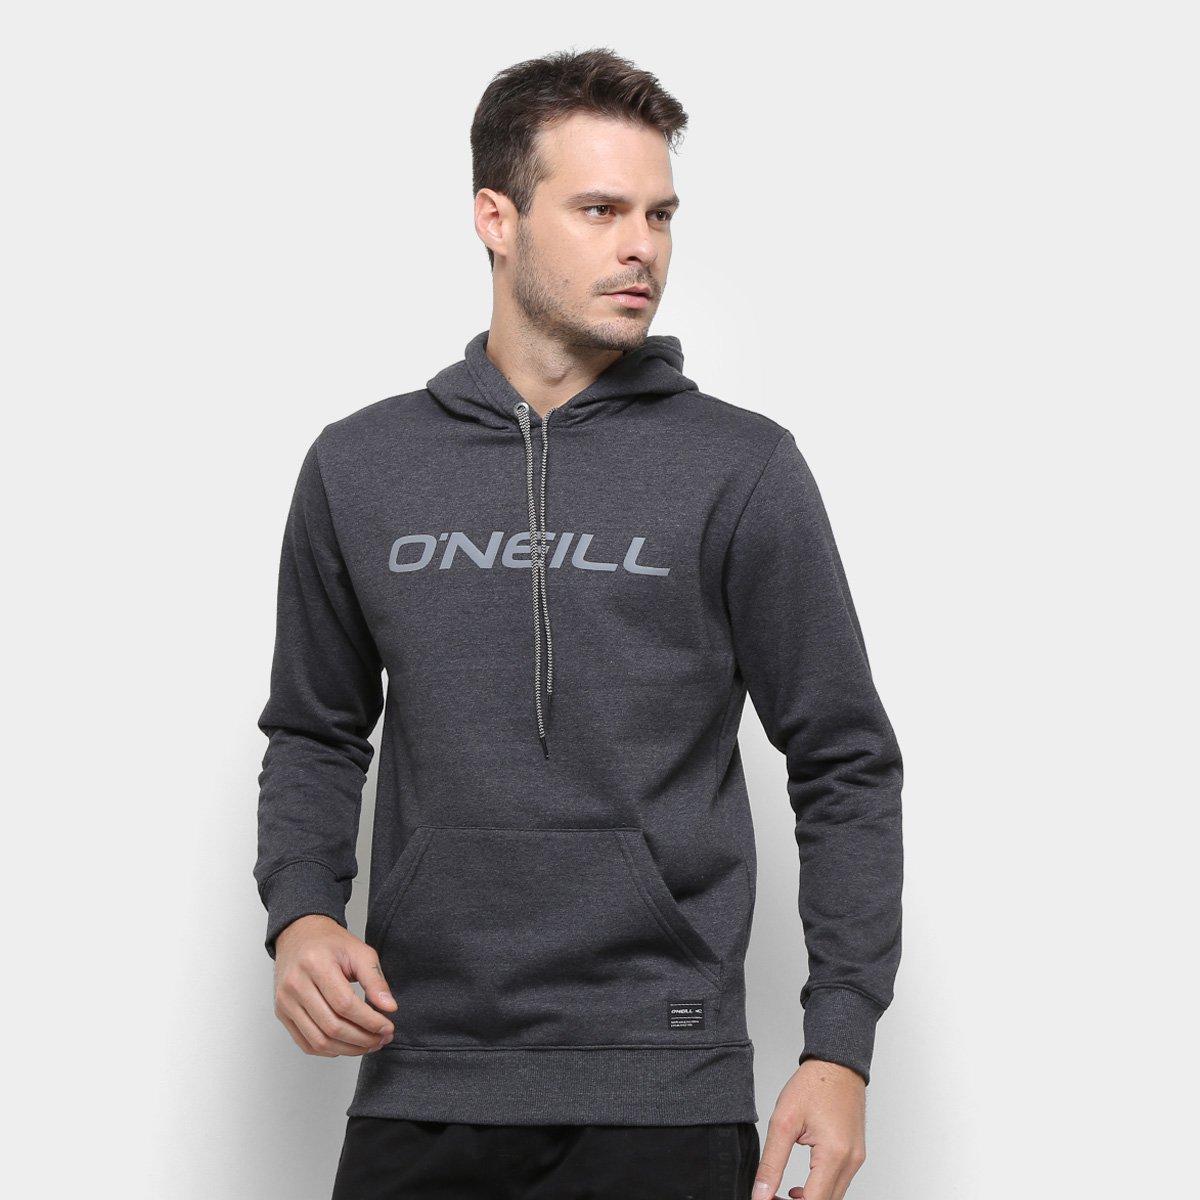 Moletom O'Neill Piste Masculino